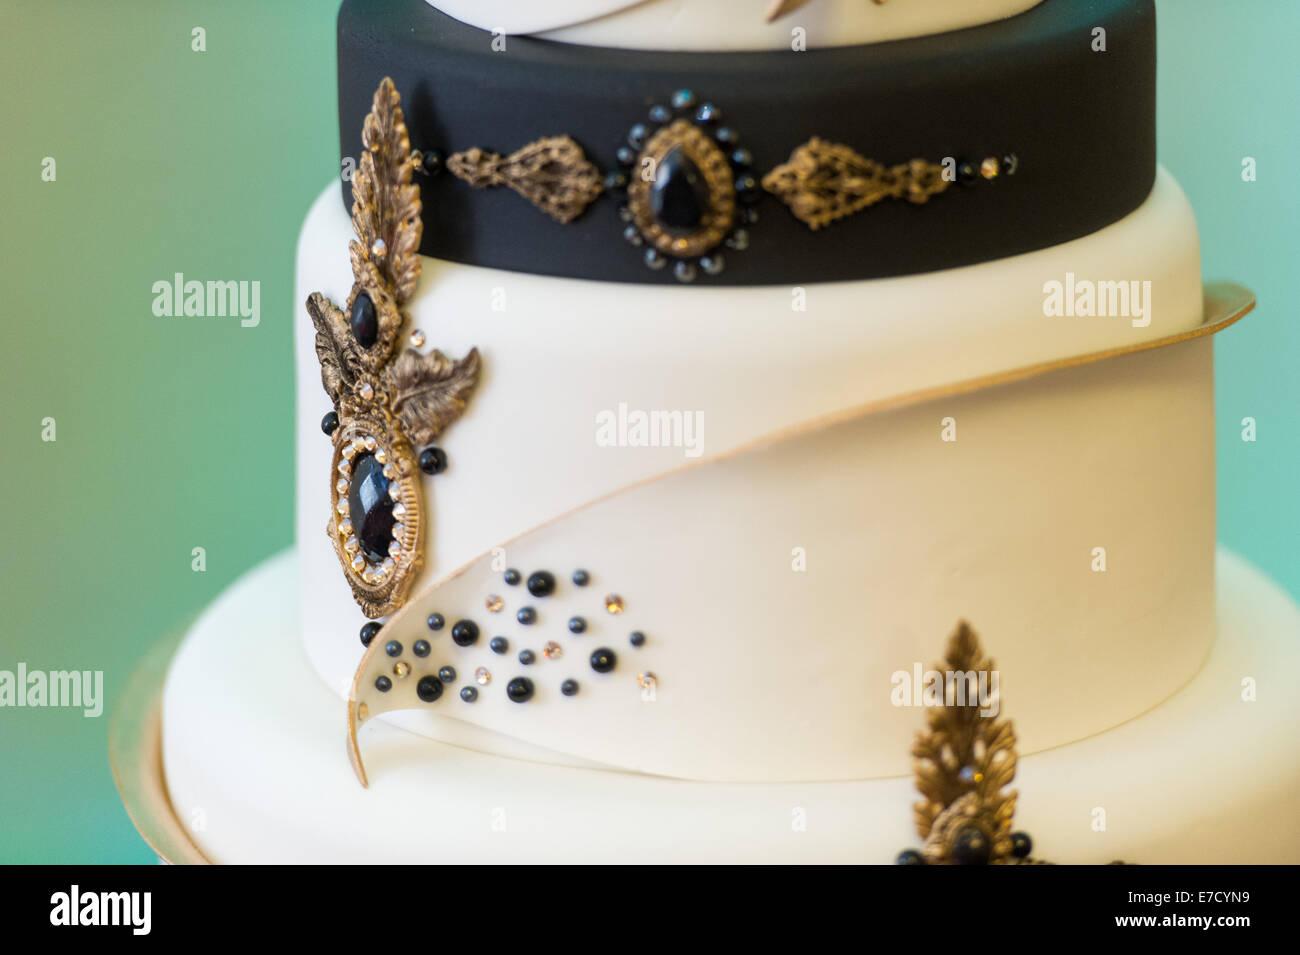 Detail of an ornate luxury cake design Stock Photo ...